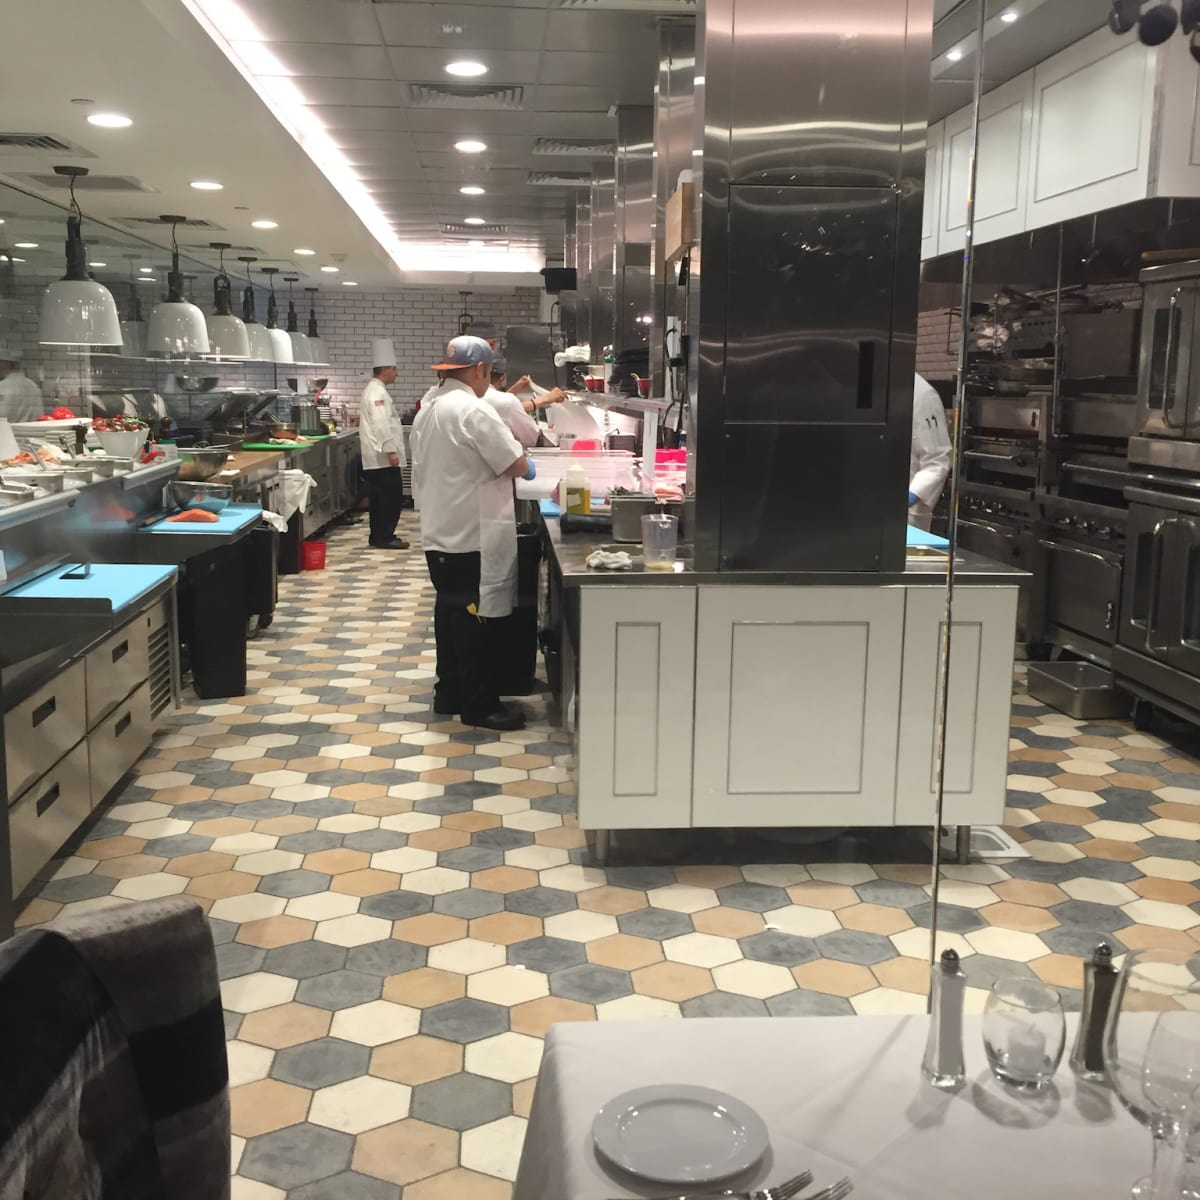 Steak 48 kitchen table